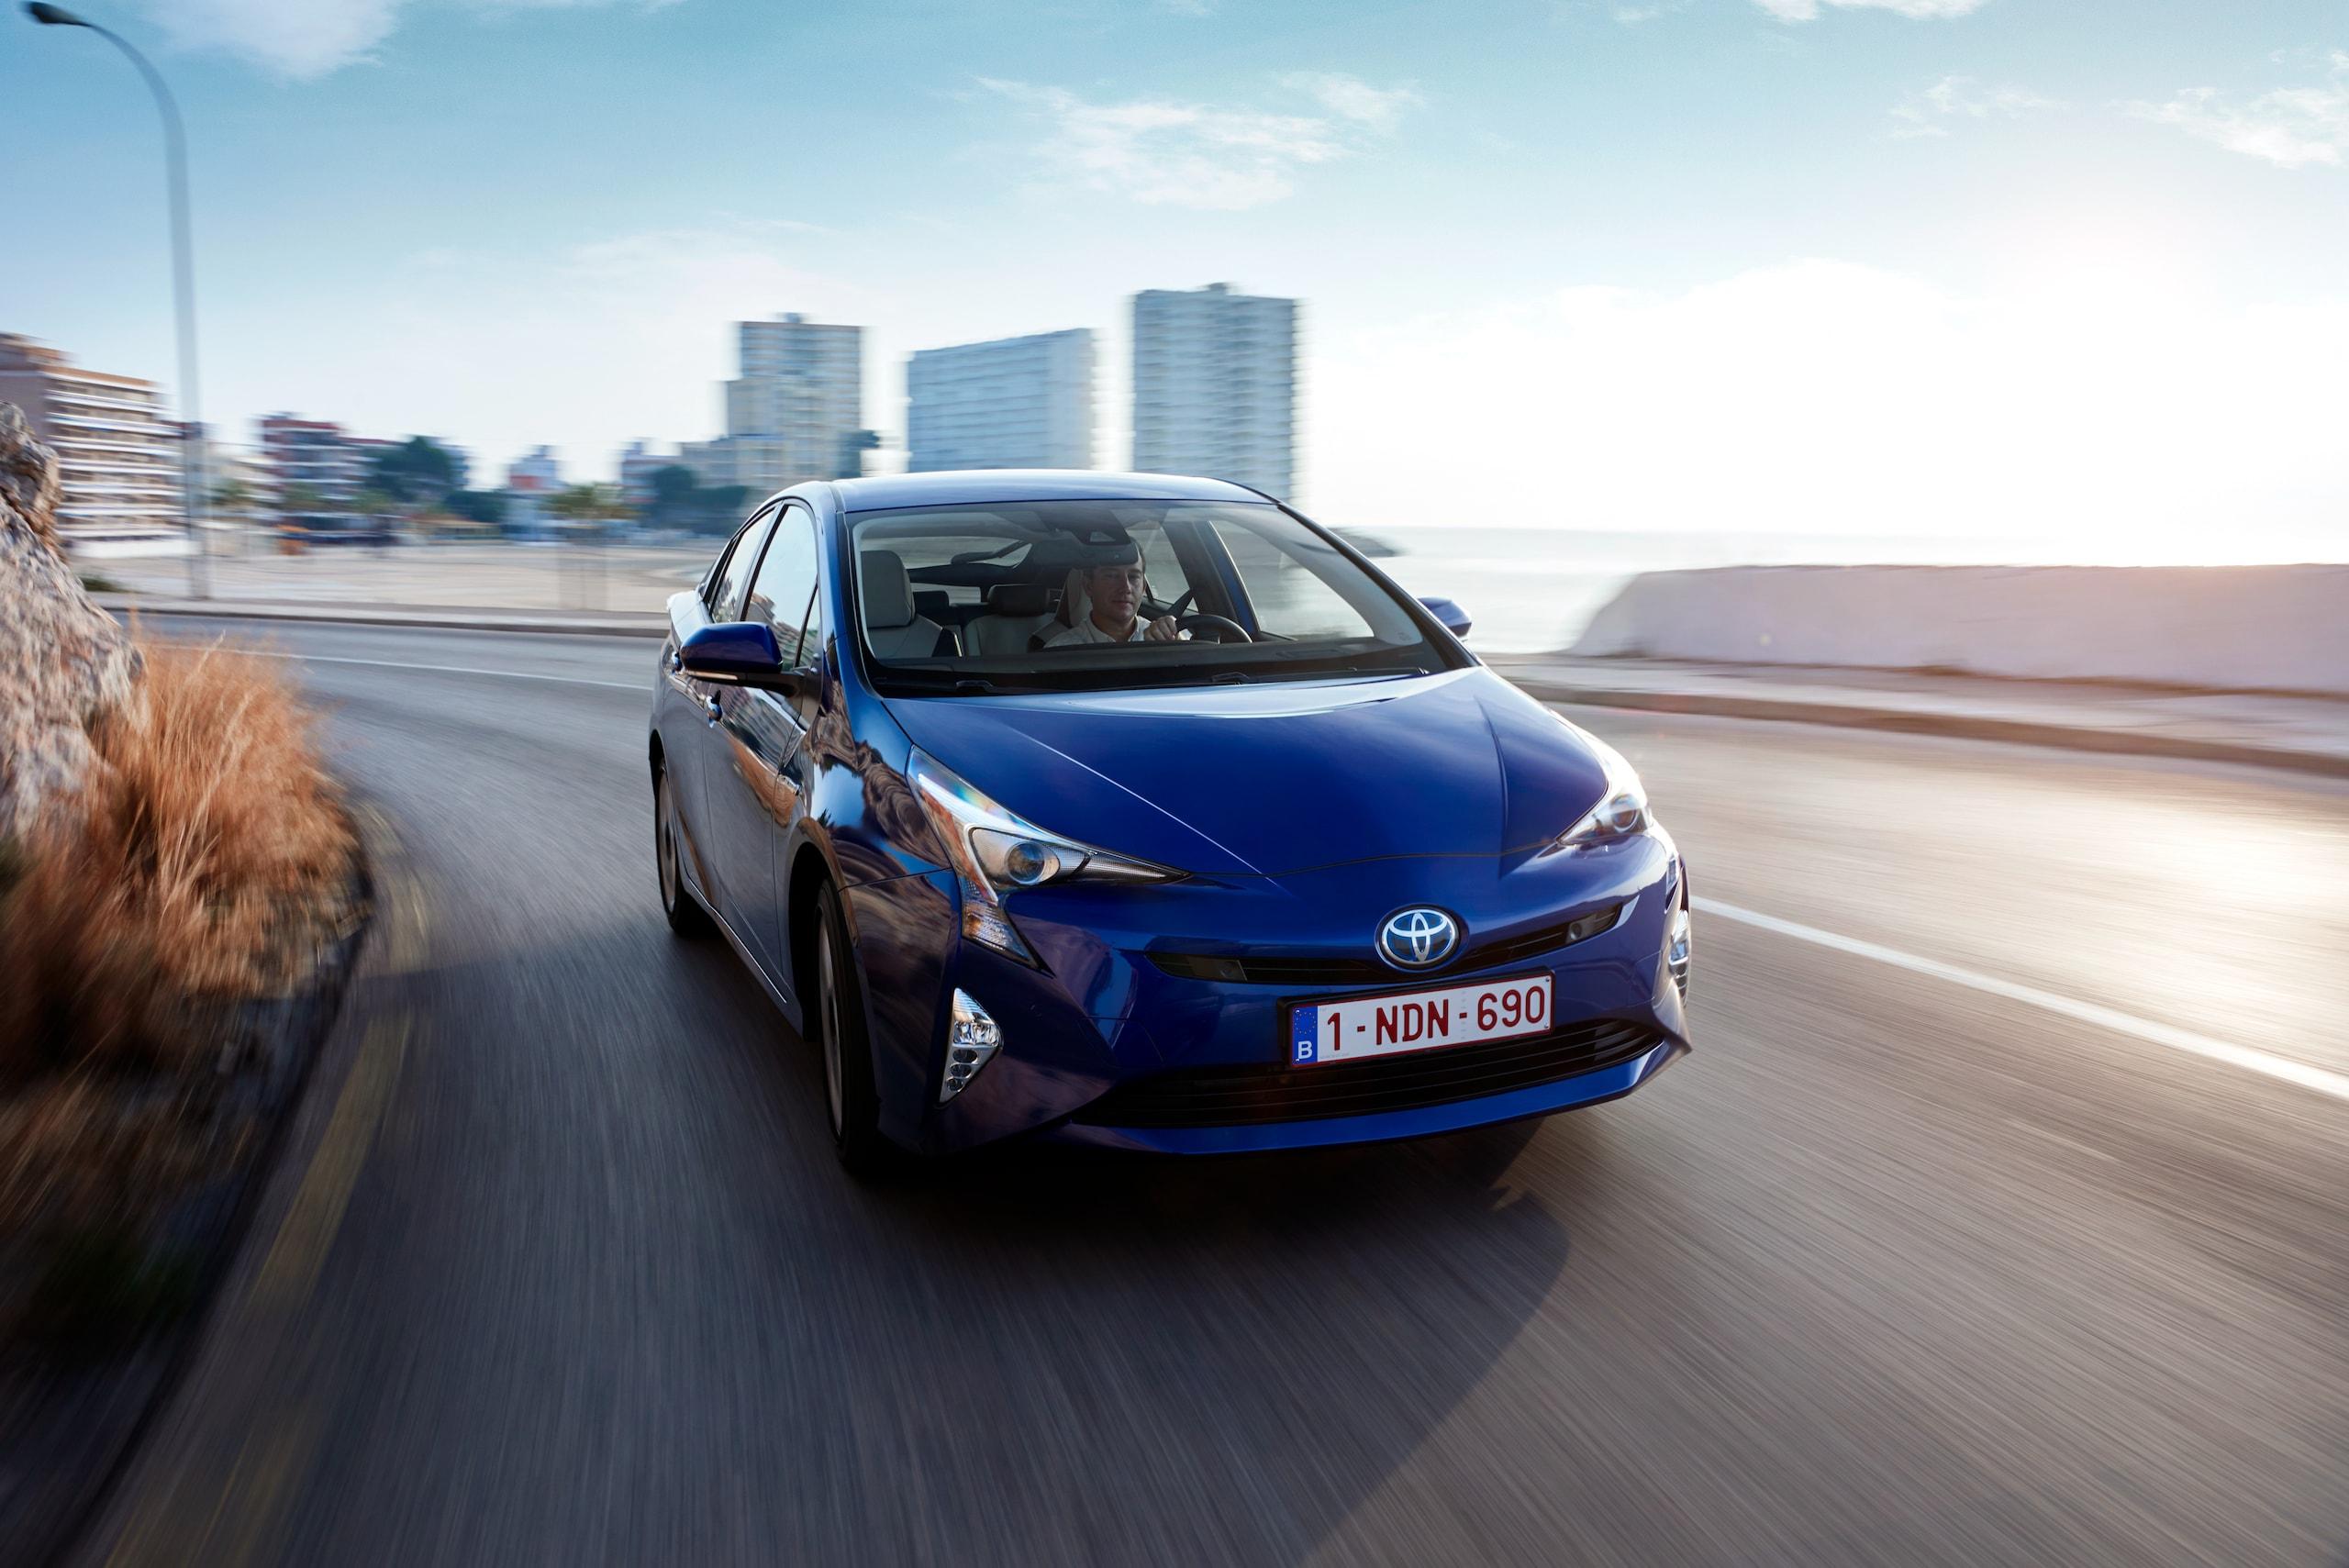 Toyota Prius, studio sulle emissioni promuove l'ibrido-elettrico